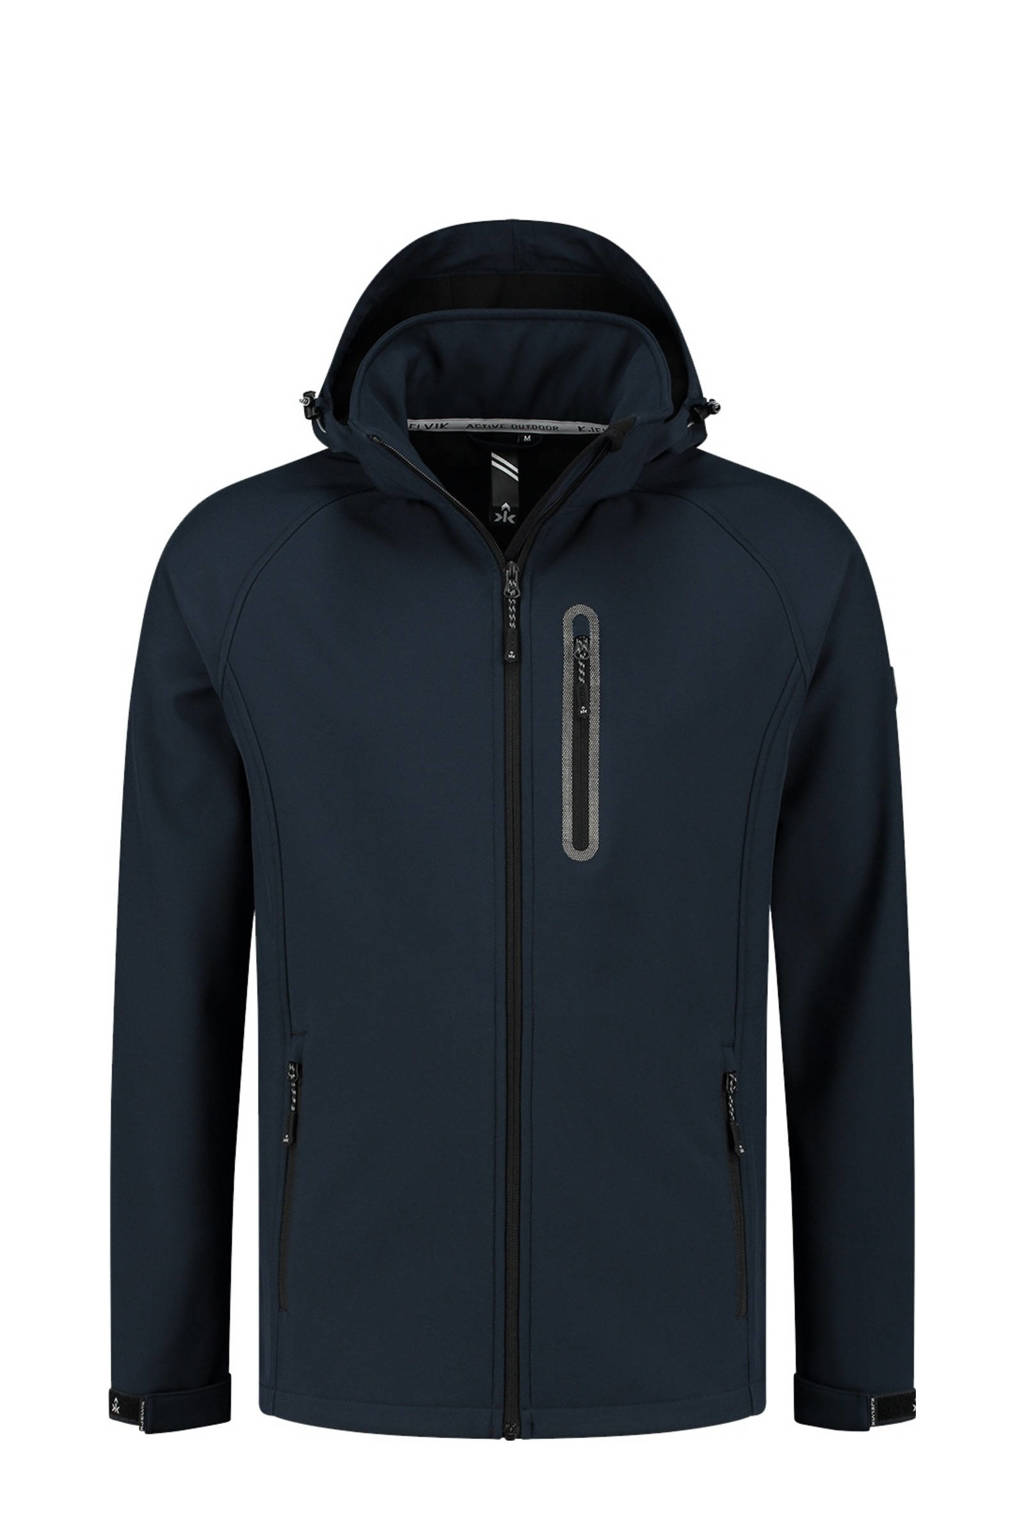 Kjelvik Plus Size outdoor jas Kevan donkerblauw, Donkerblauw